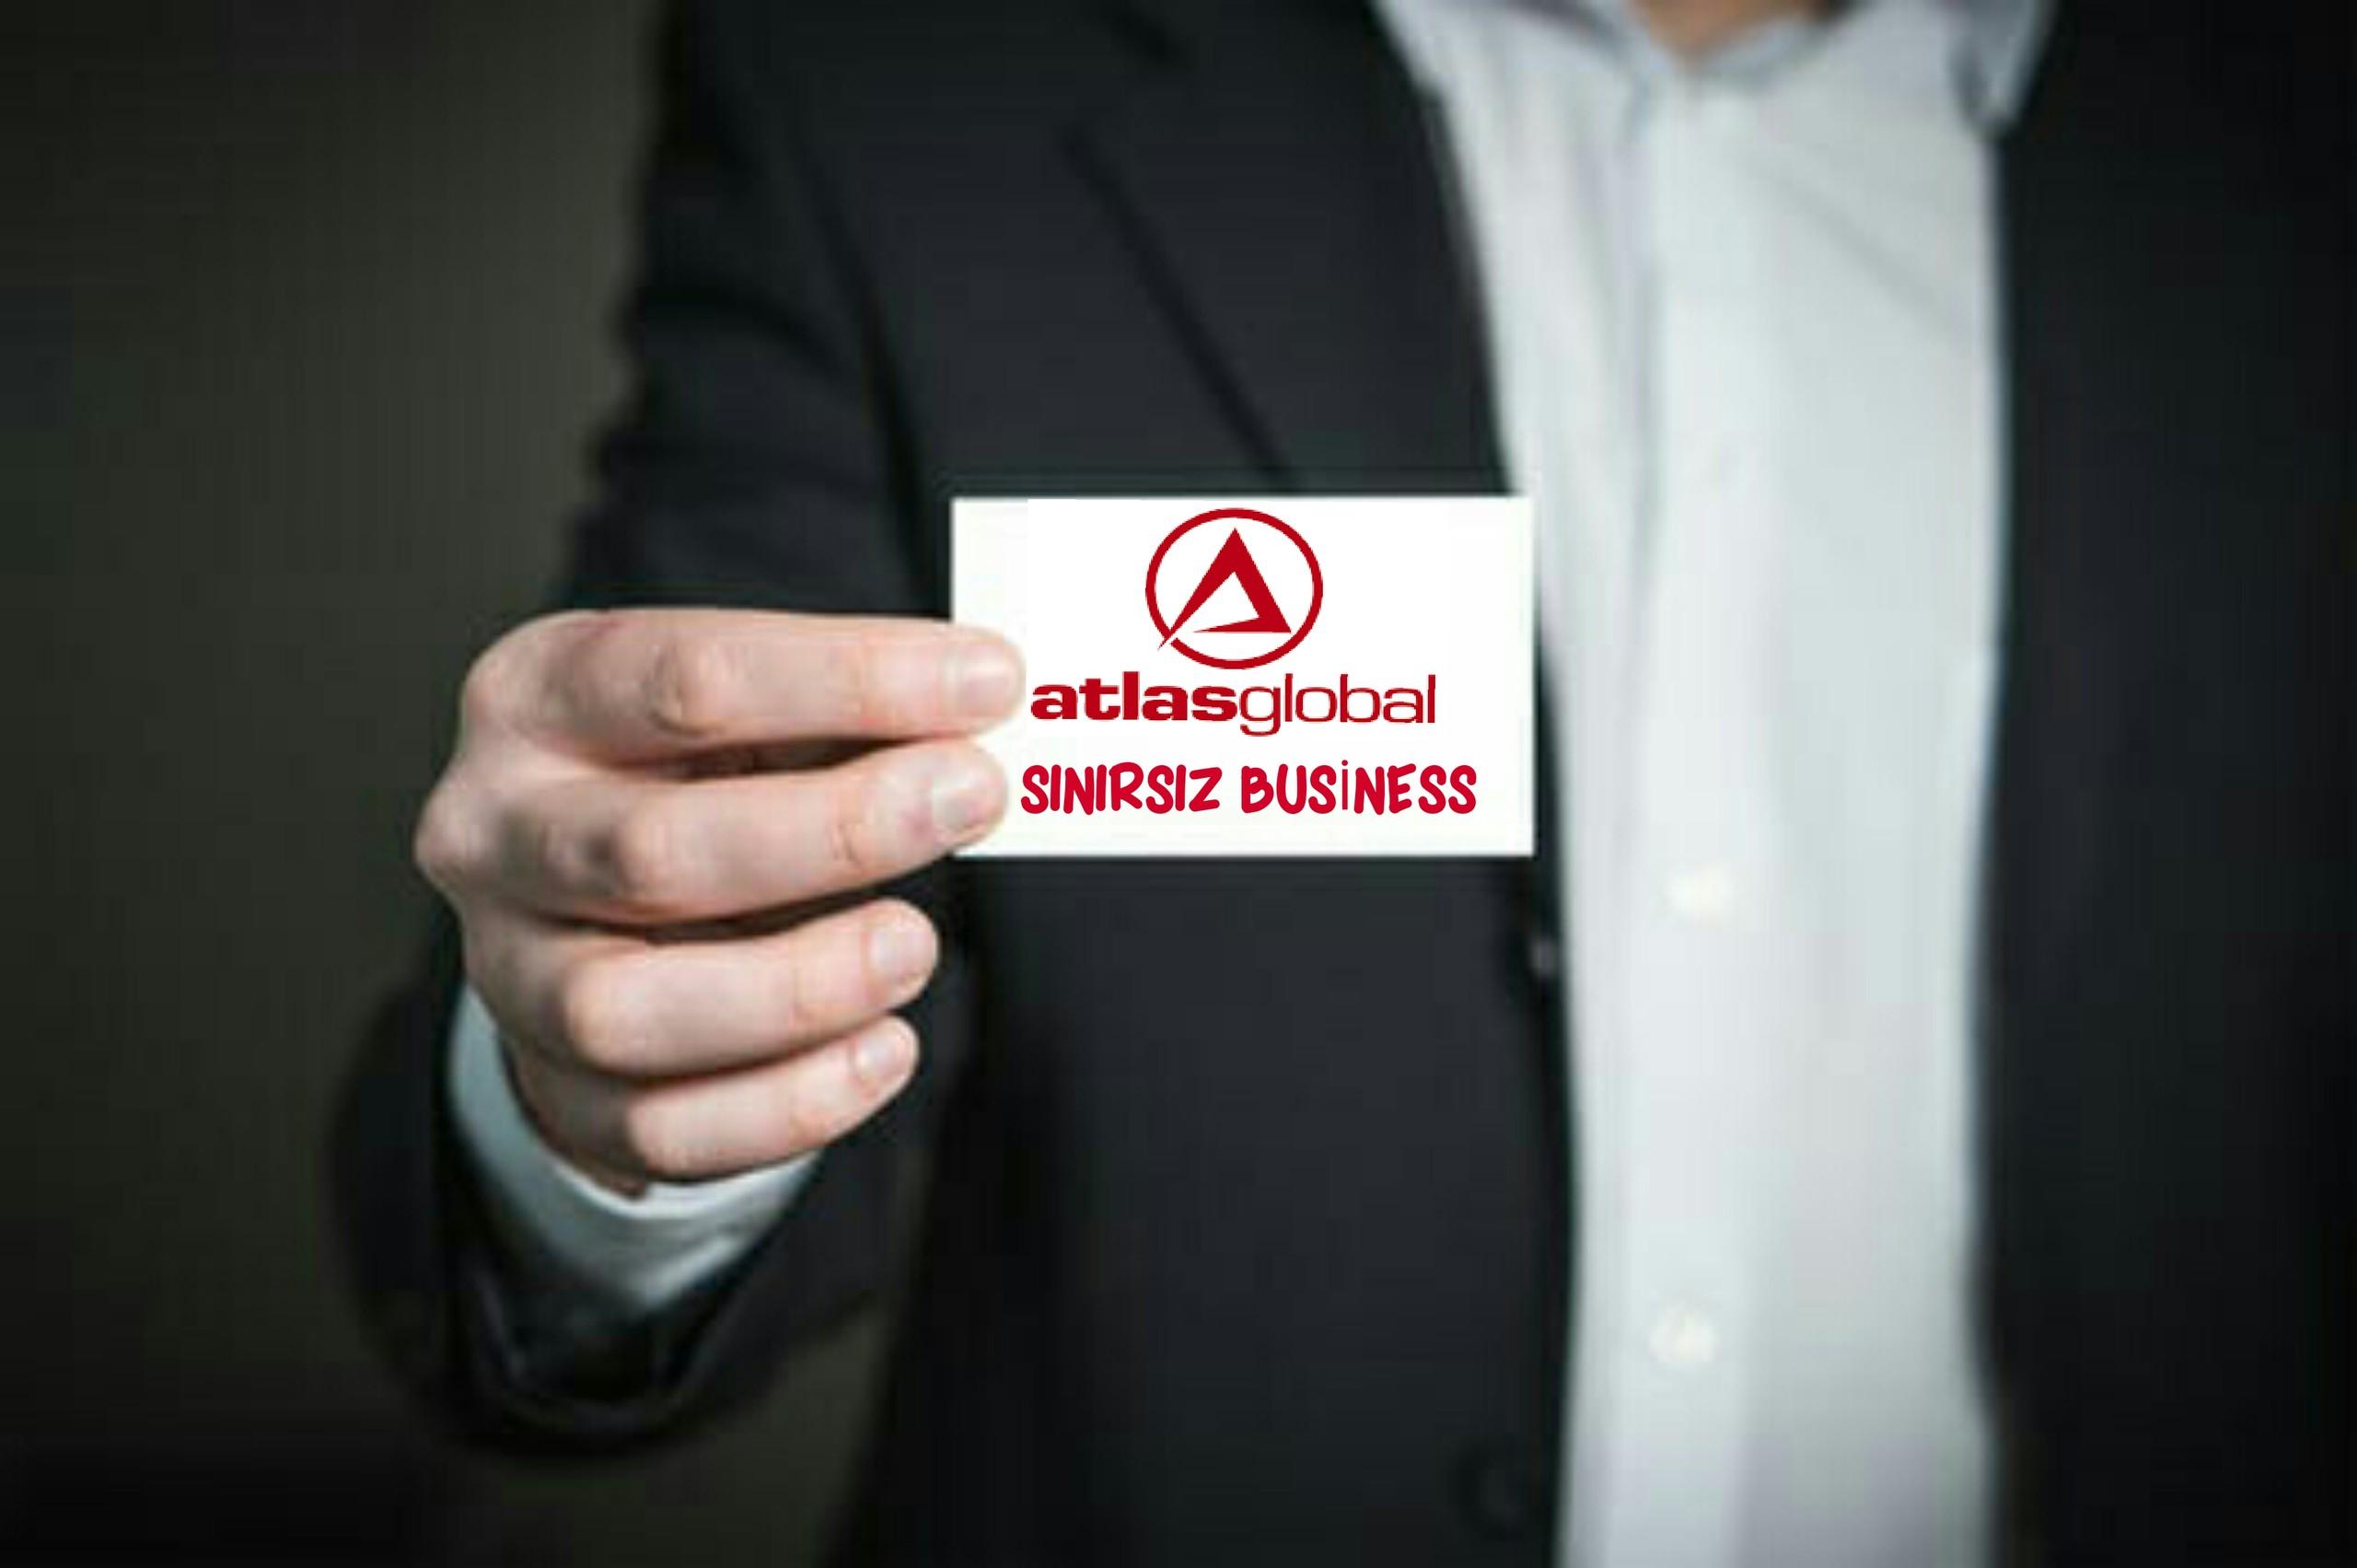 Sınırsız business class